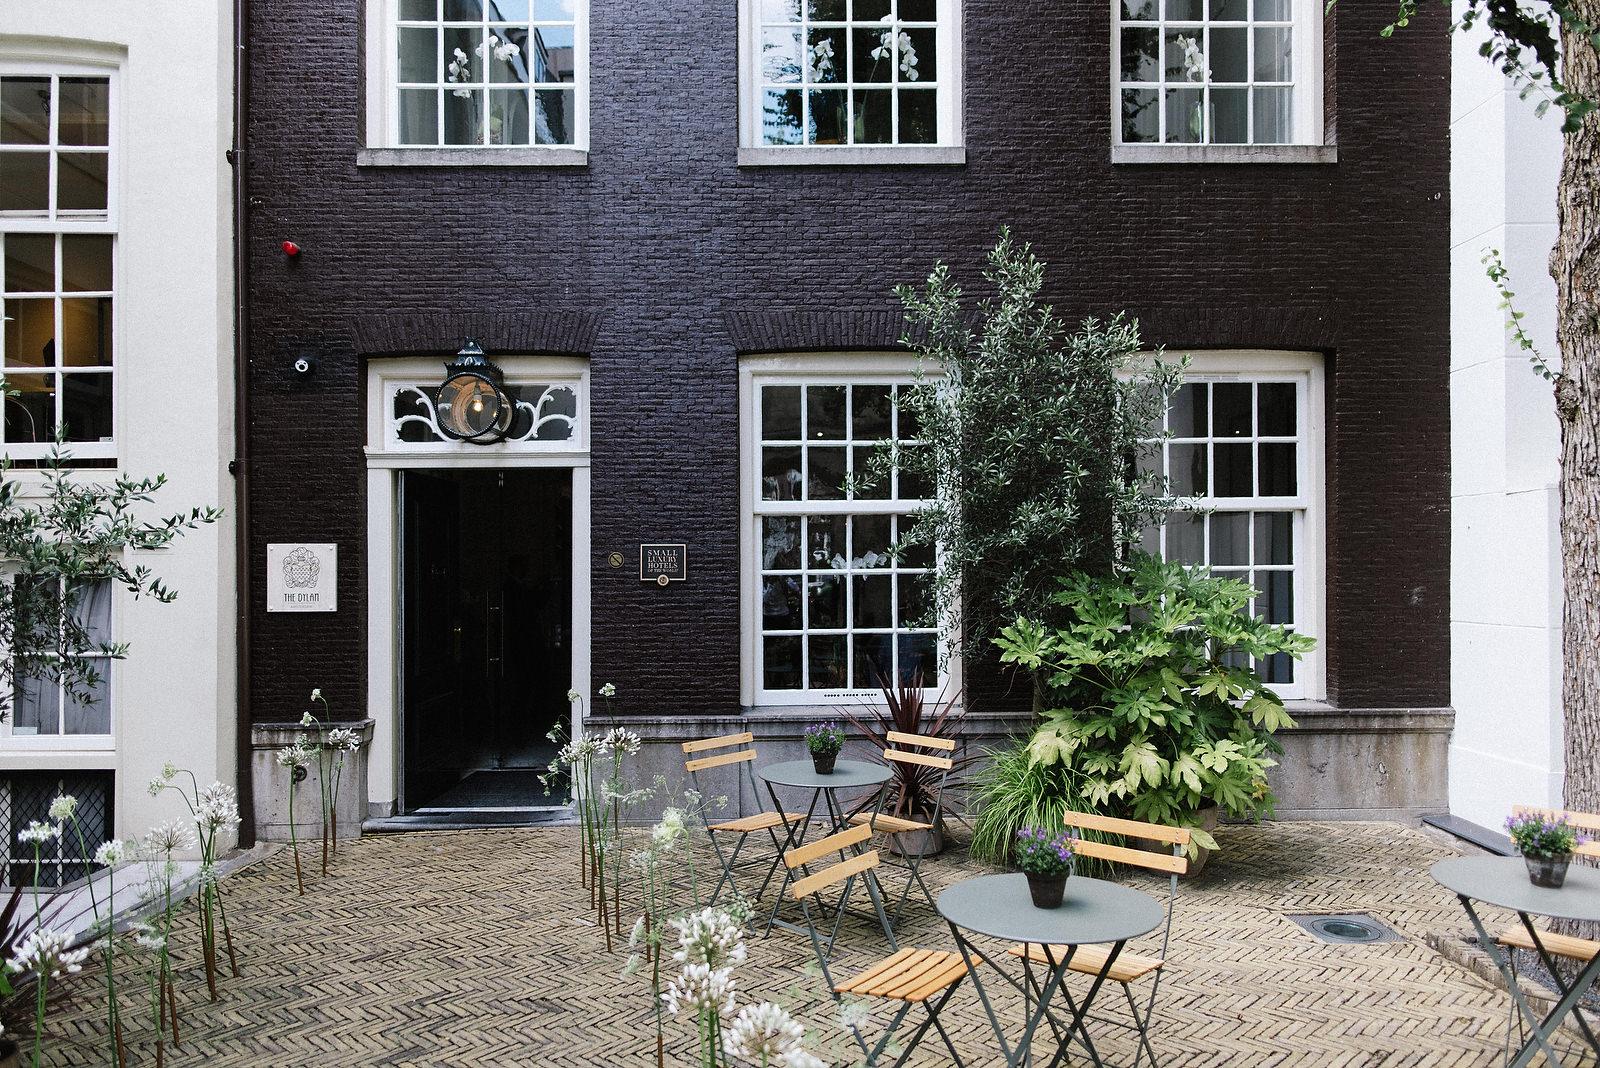 Fotograf Konstanz - Destination Wedding Photographer Amsterdam 066 - Destination Wedding Amsterdam  - 175 -